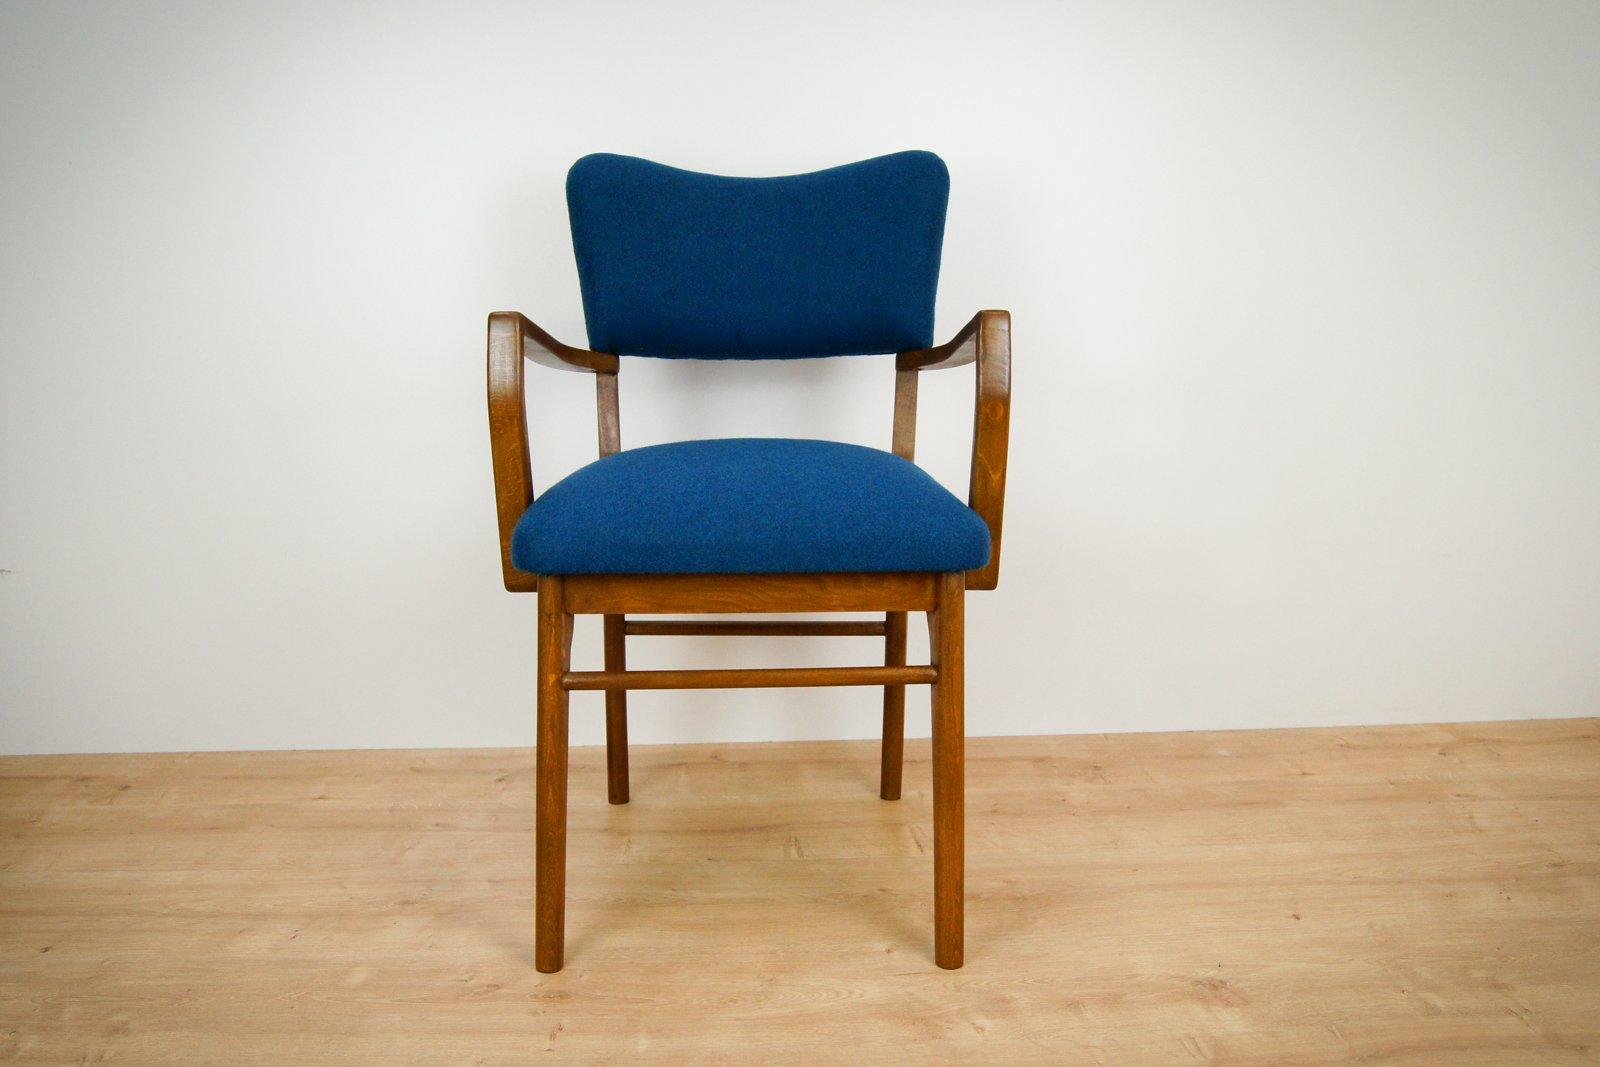 art deco armlehnstuhl 1930er bei pamono kaufen. Black Bedroom Furniture Sets. Home Design Ideas